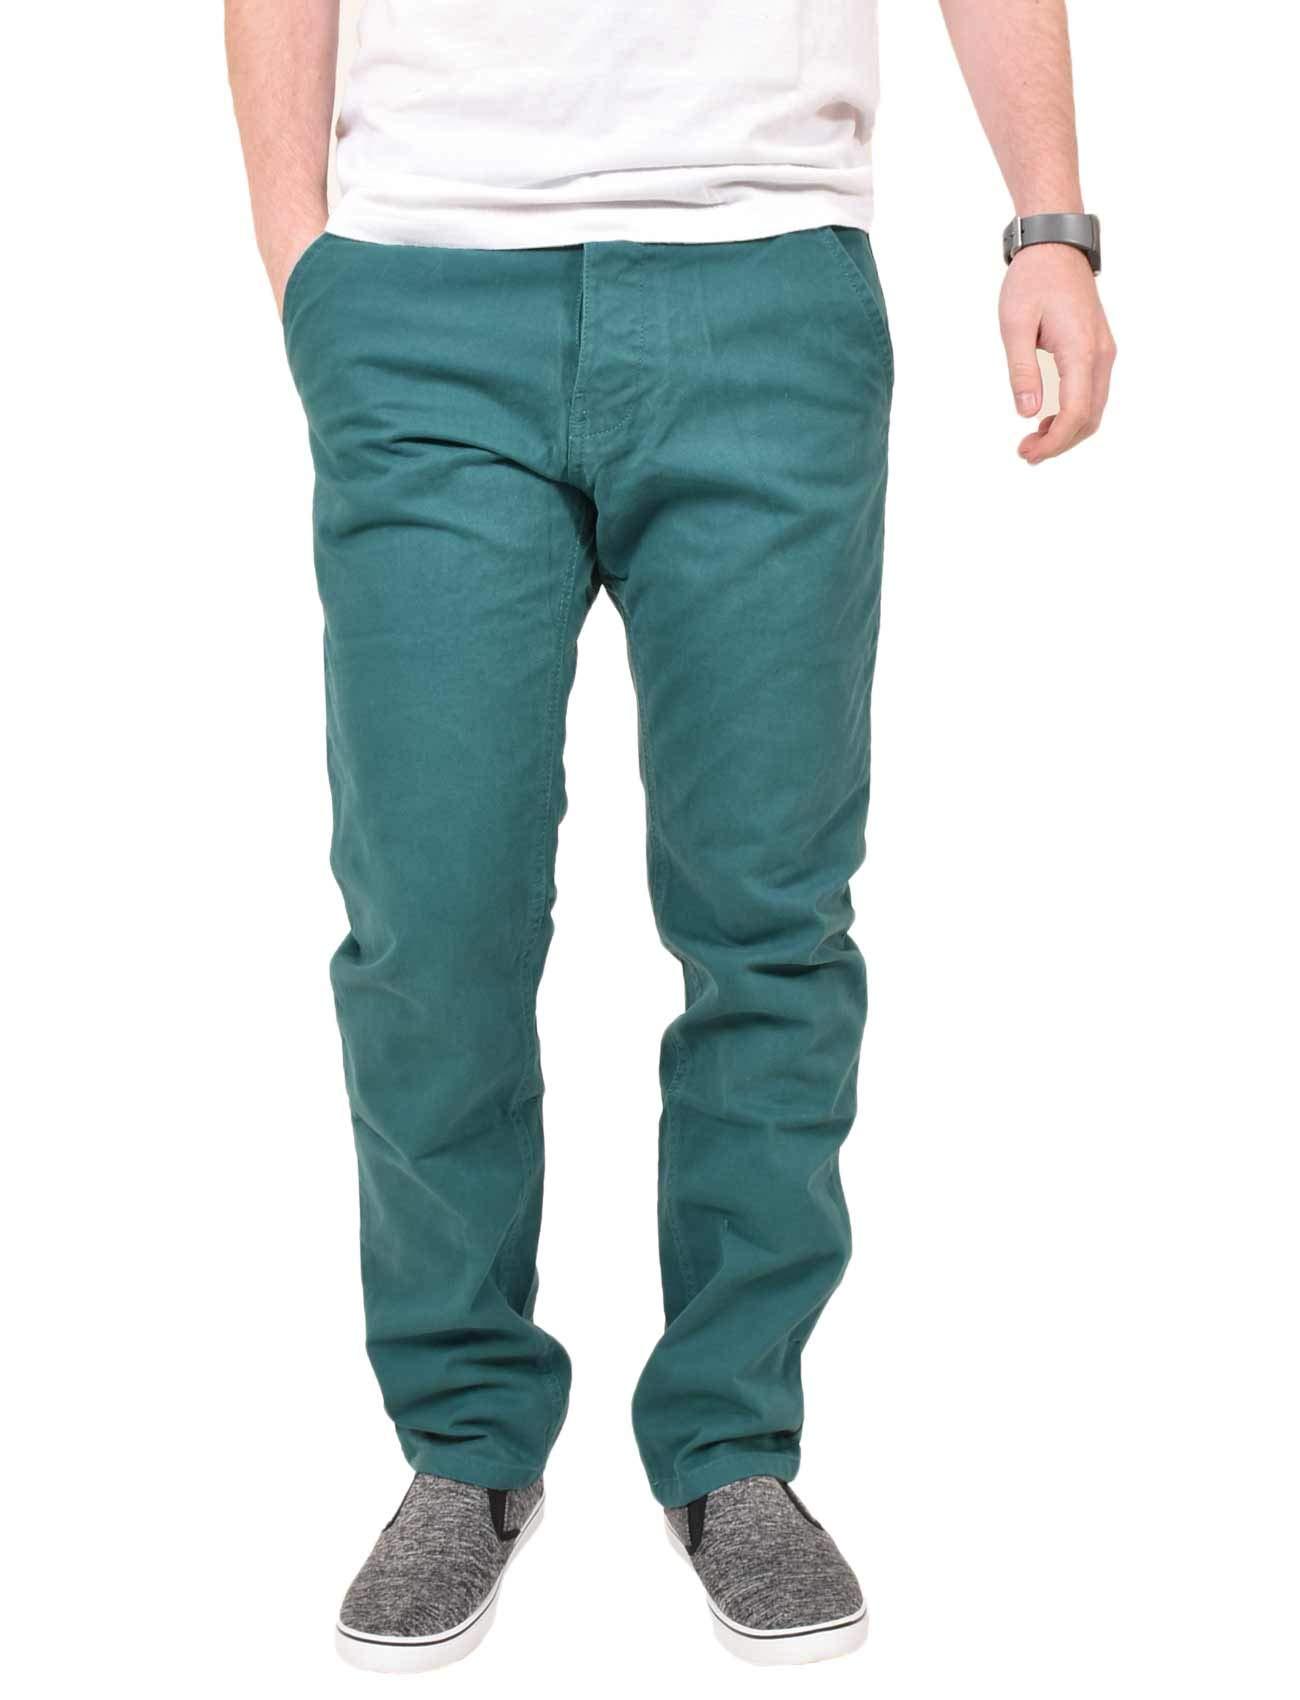 Mens Kushiro City Jeans Slim Fit Twill Chino Straight Leg Trousers Cotton Pants